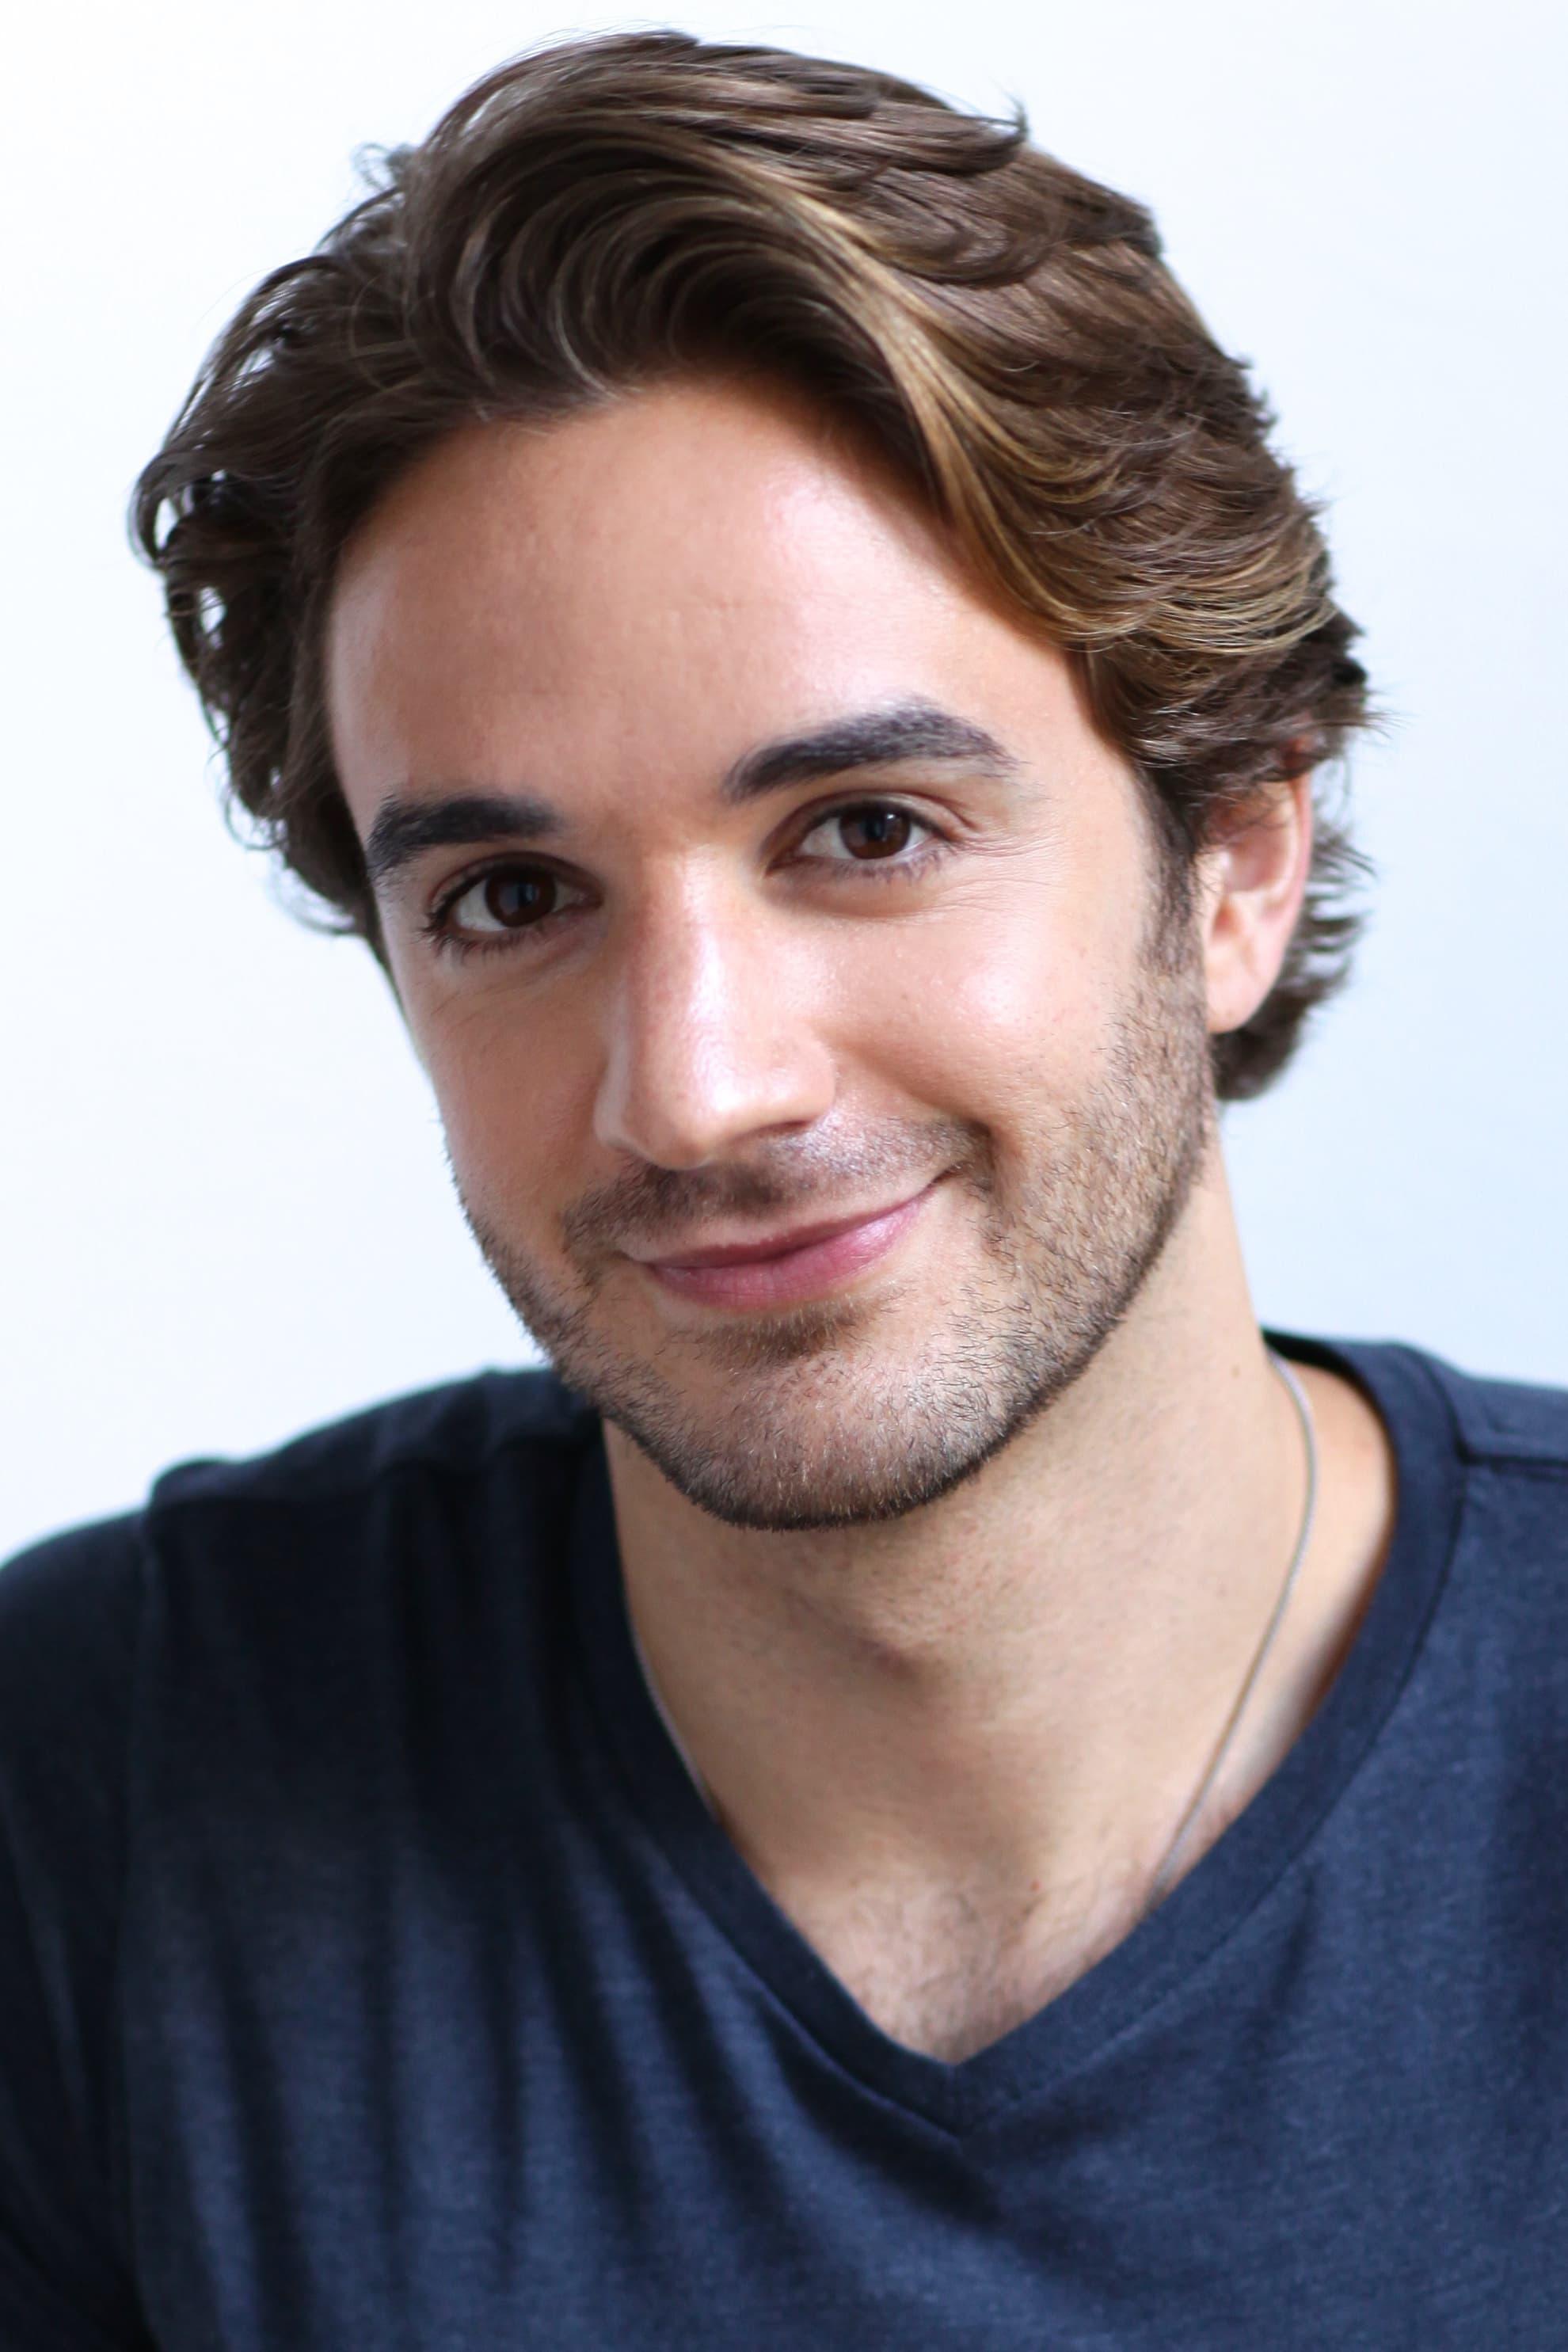 AJ Cedeno